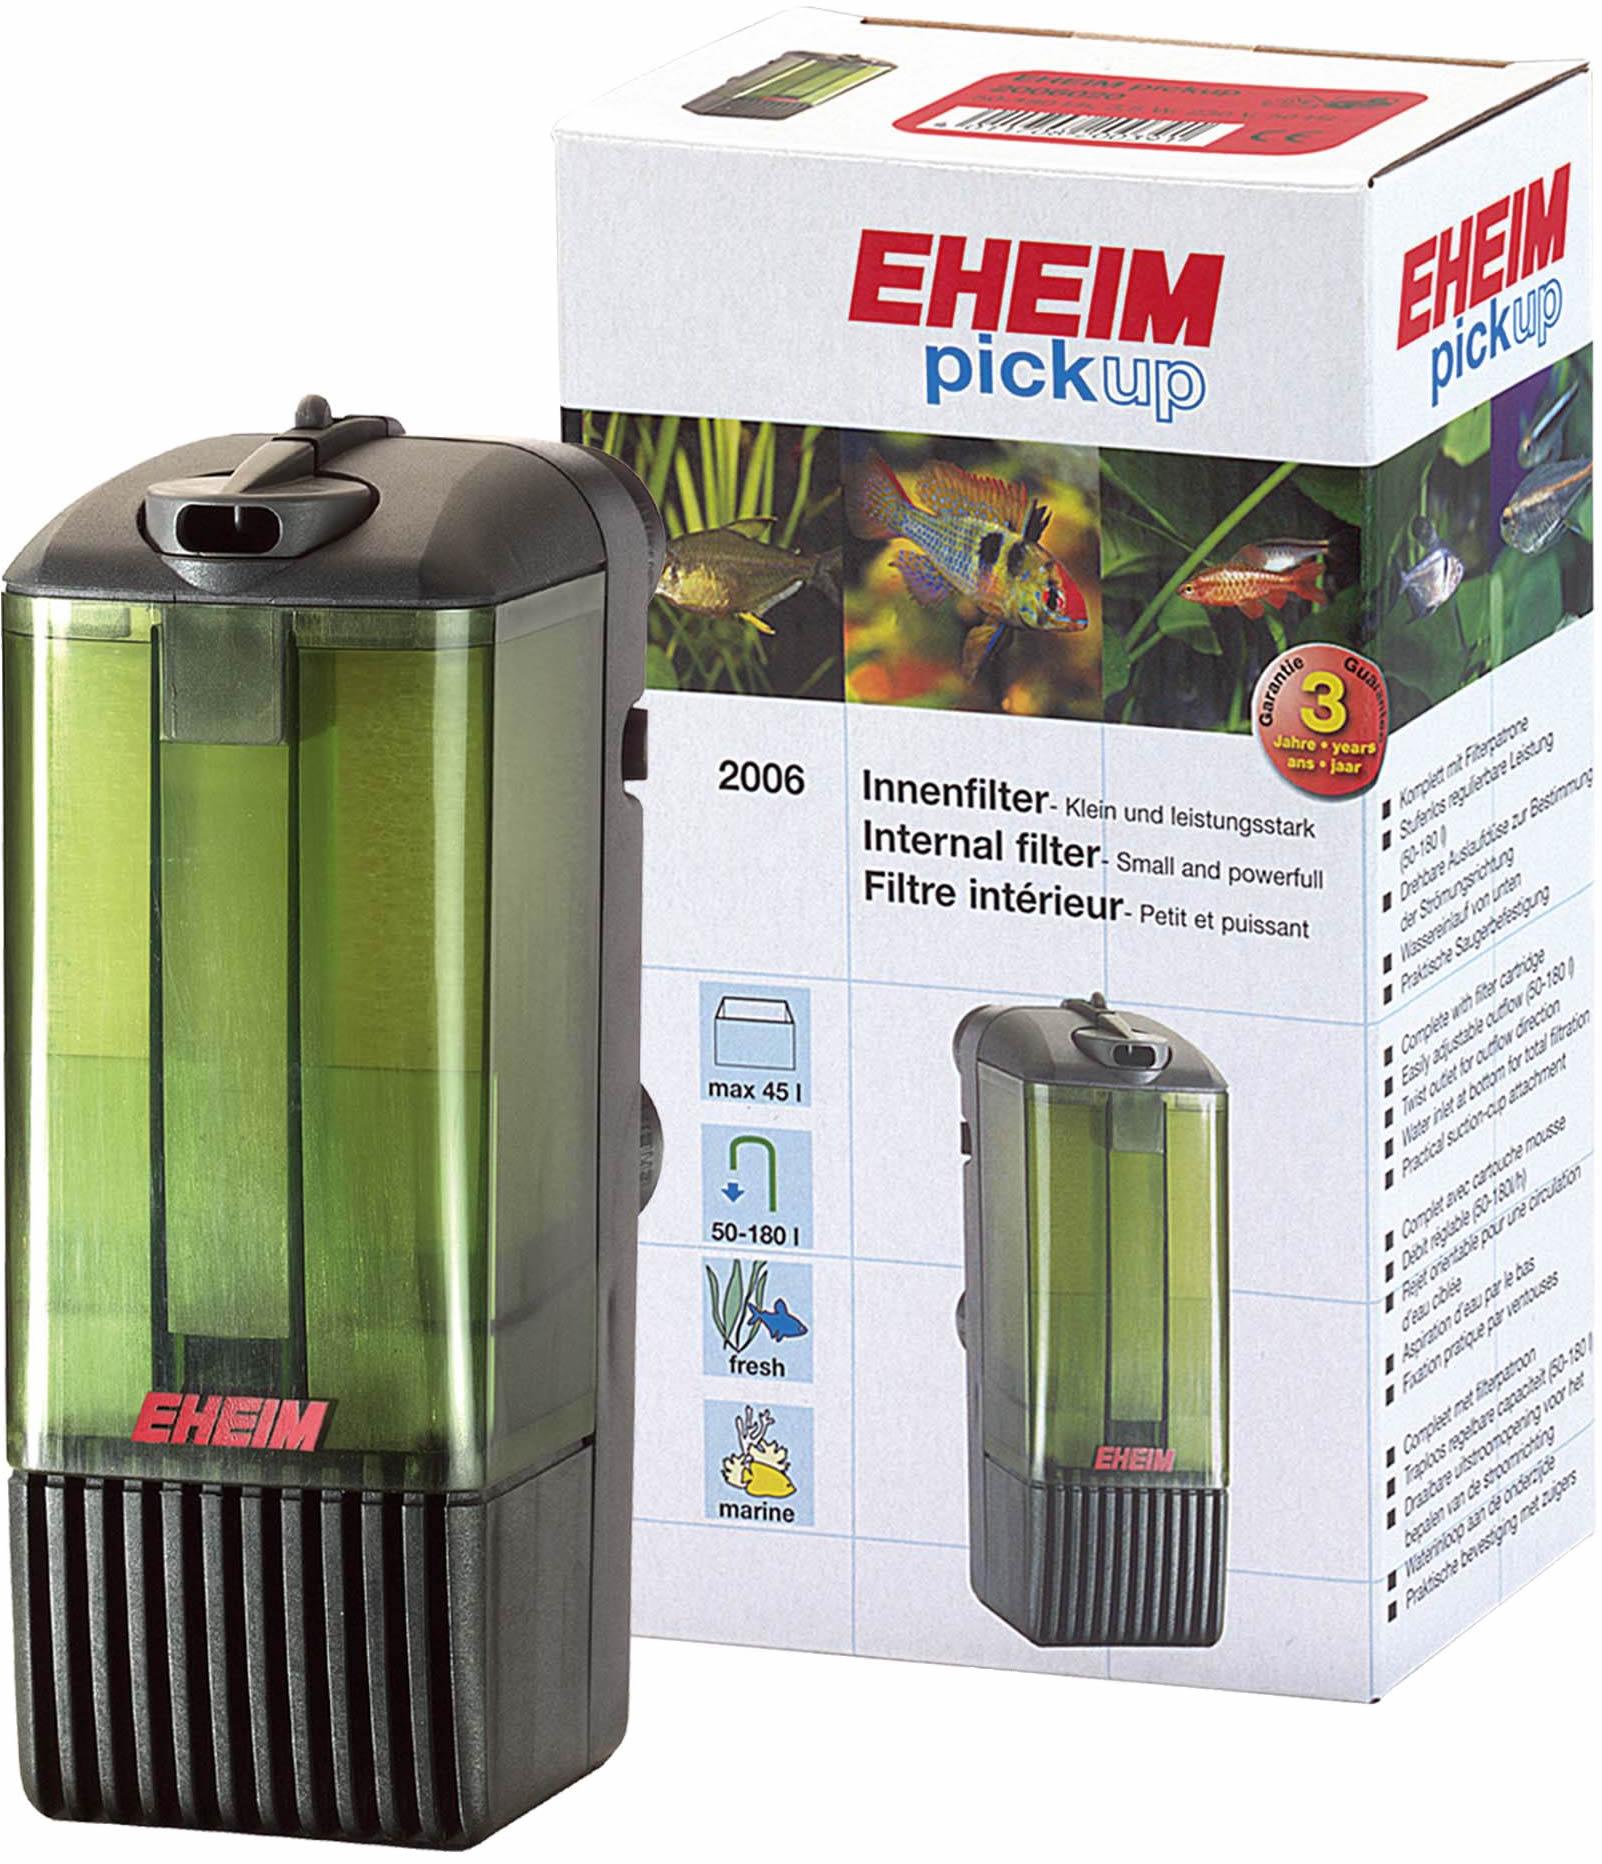 EHEIM Innenfilter pickup 45 - 2006 [2006020]